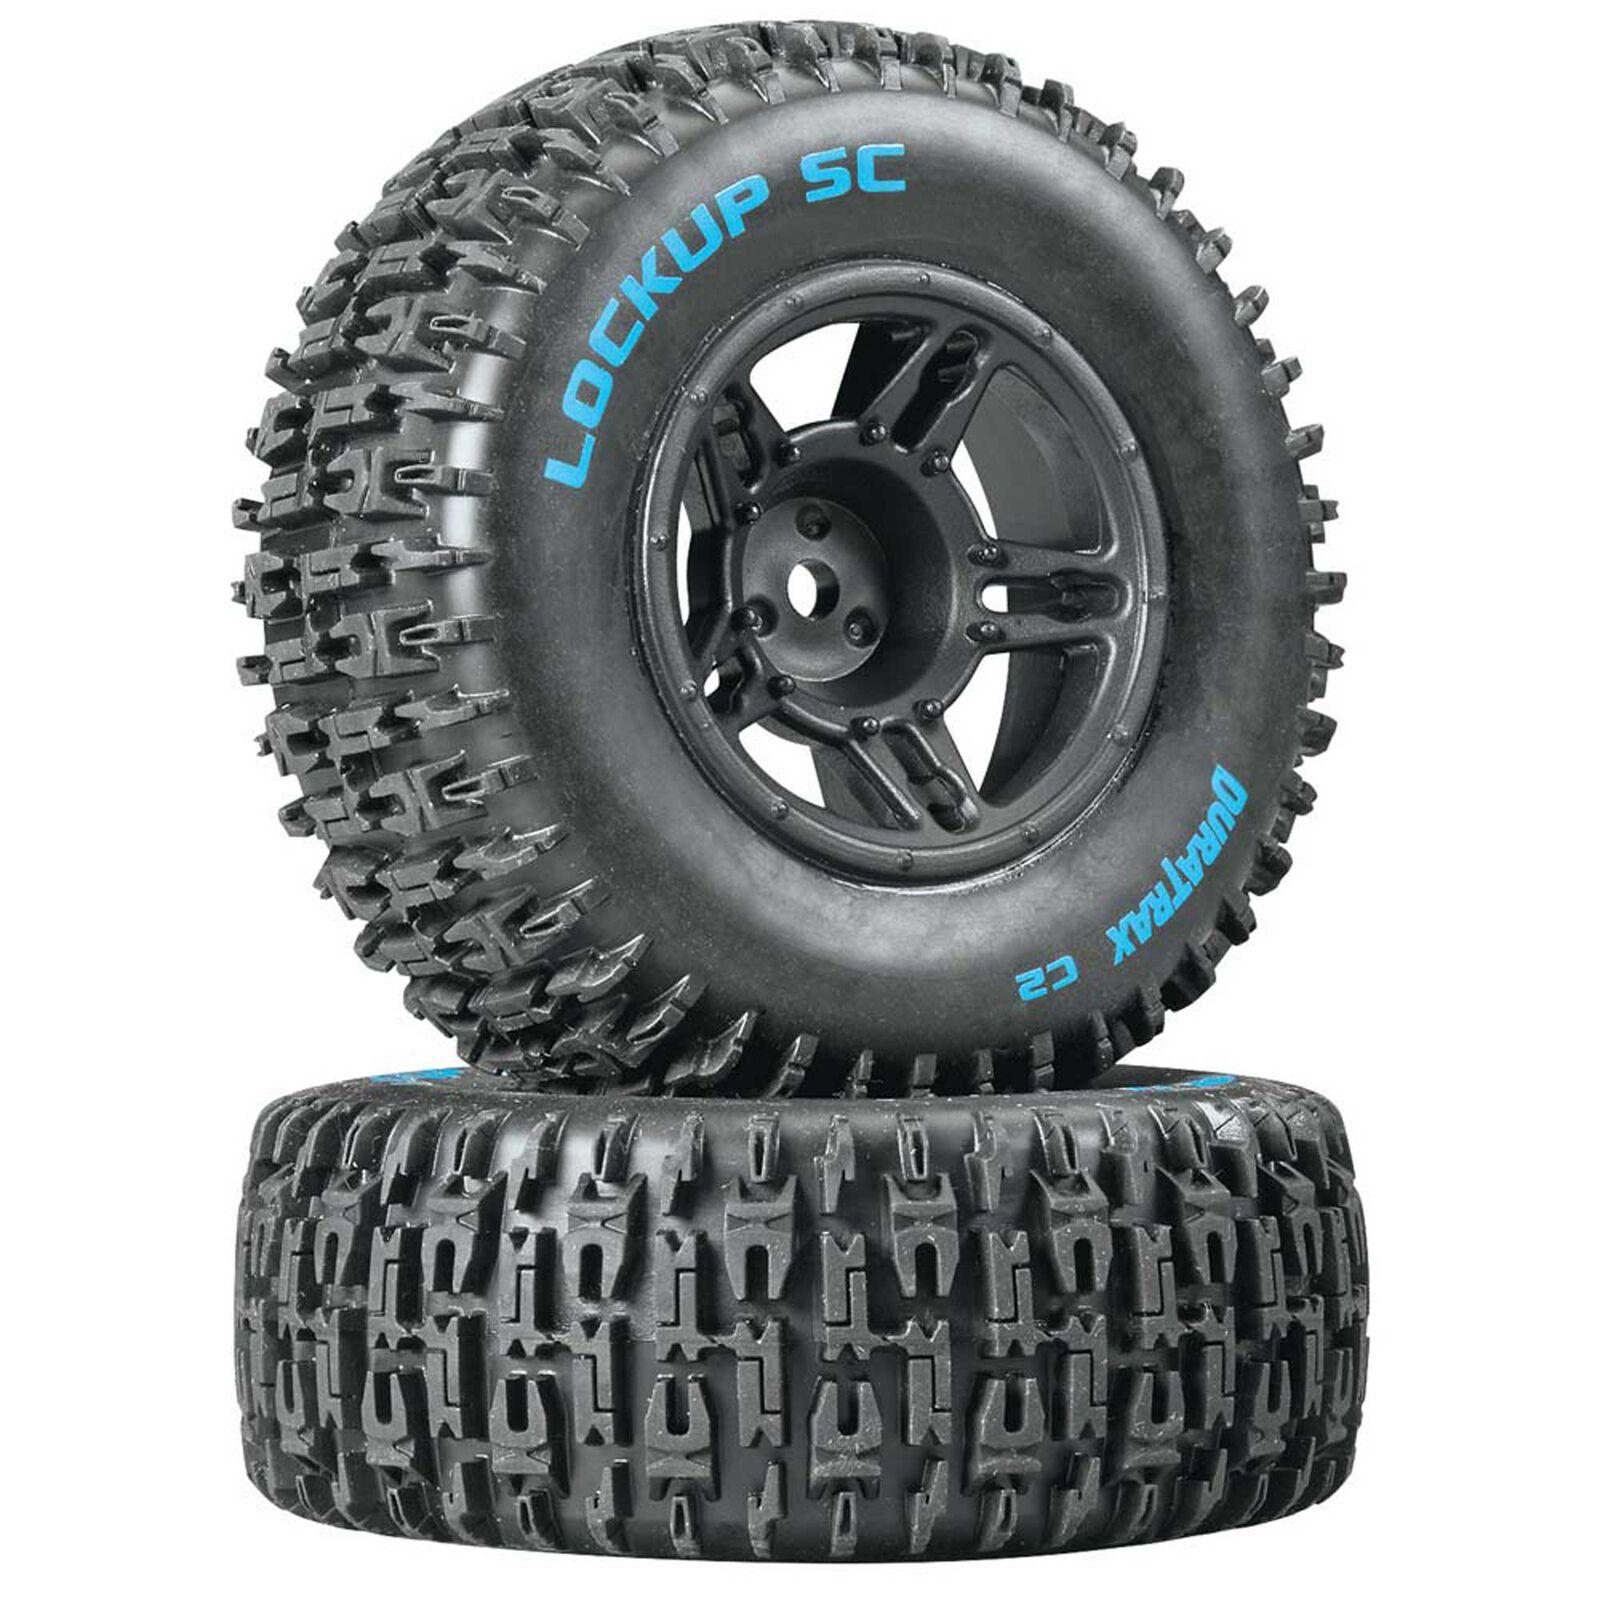 Lockup SC Tire C2 Mounted Black Front: Slash(2)